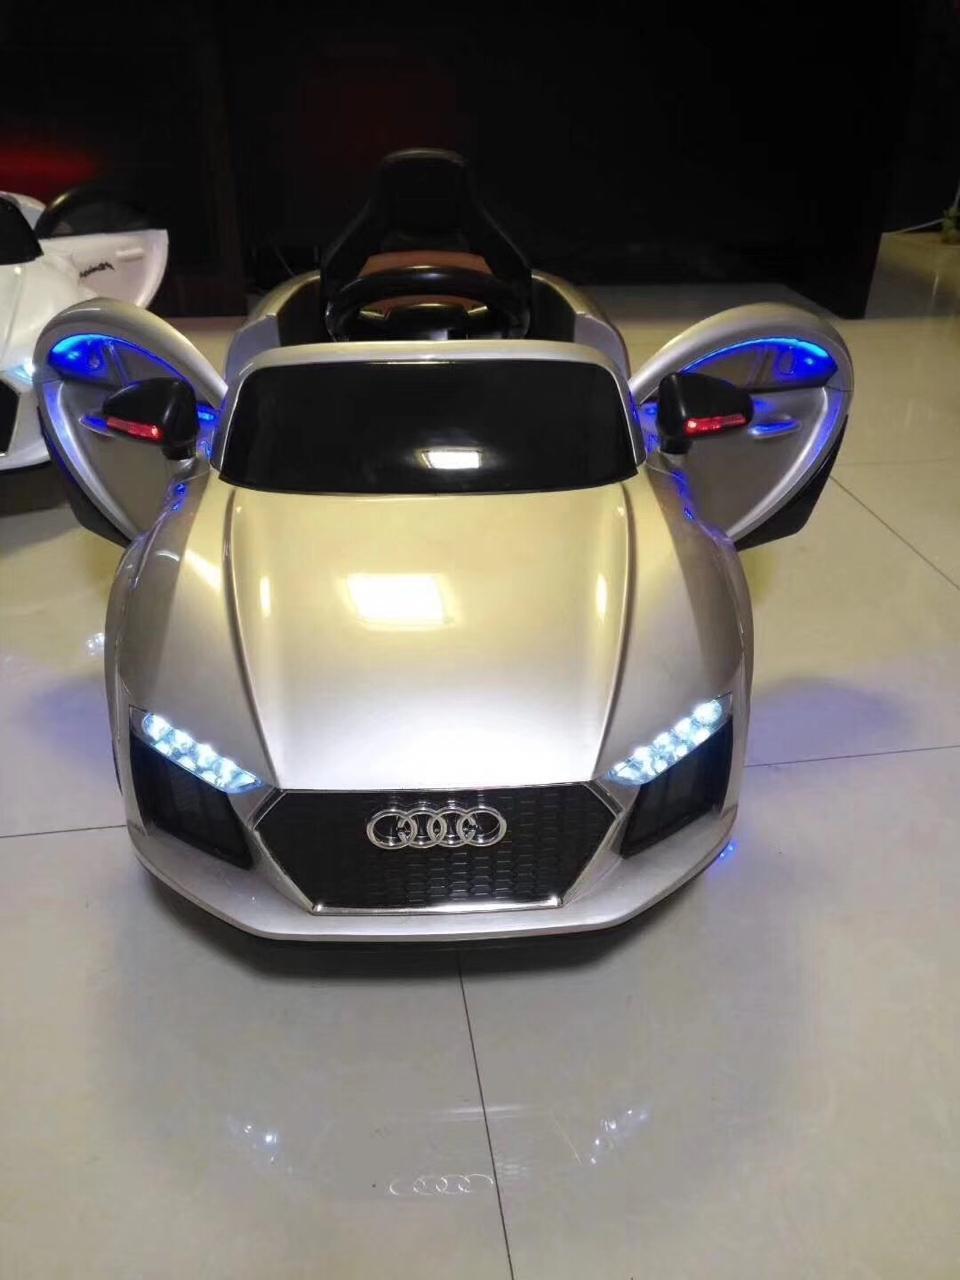 Buy Remote Control Cars & Toys @ Best Price in Pakistan - Daraz pk